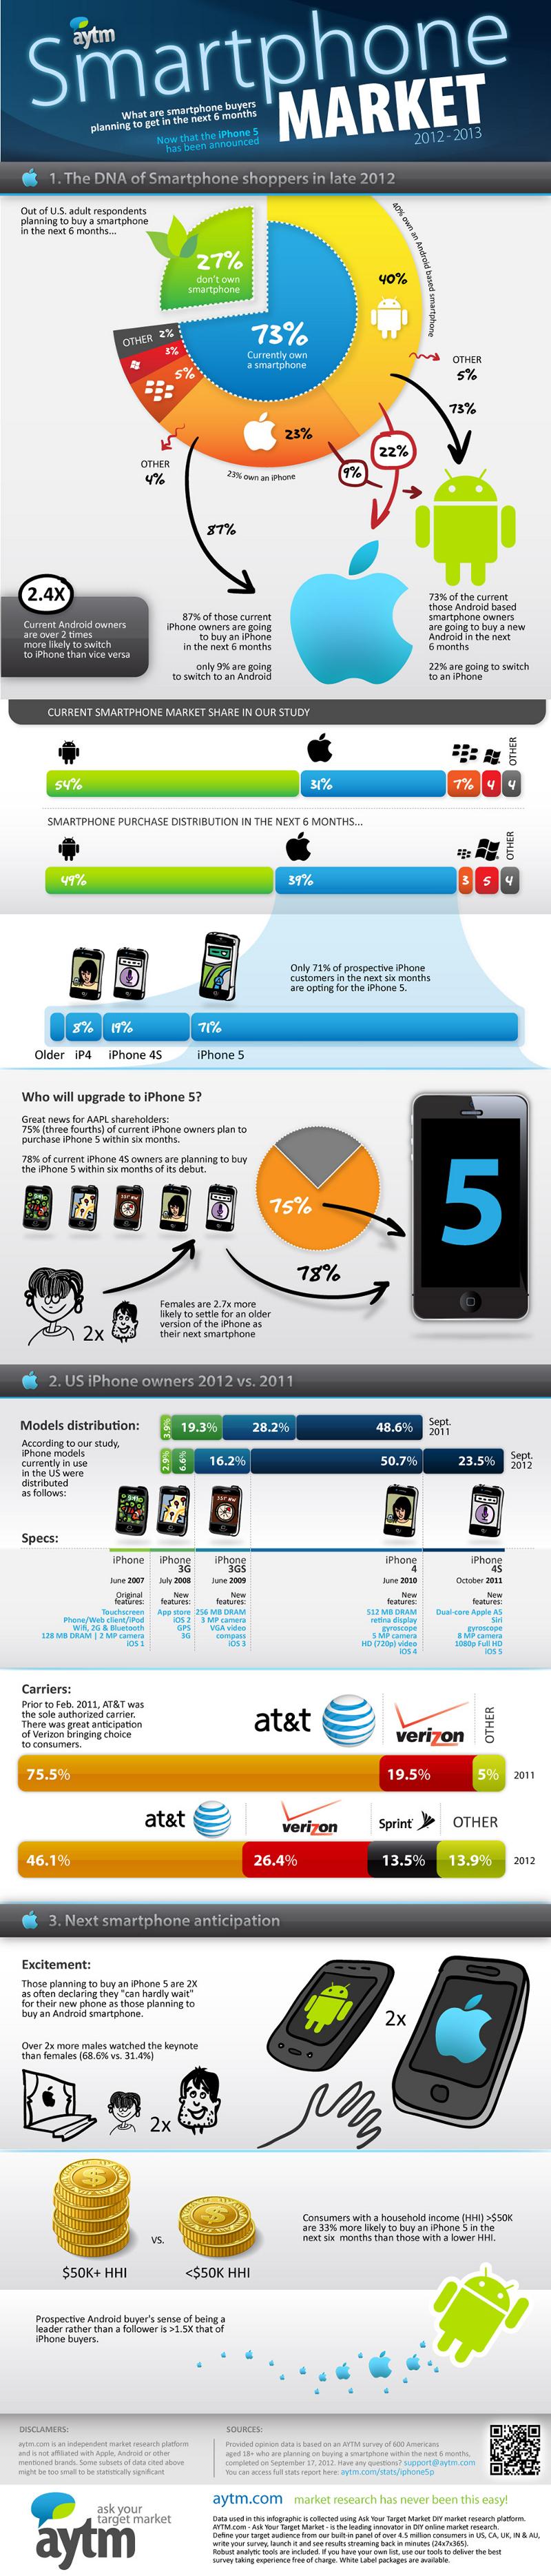 Smartphone Market Segments